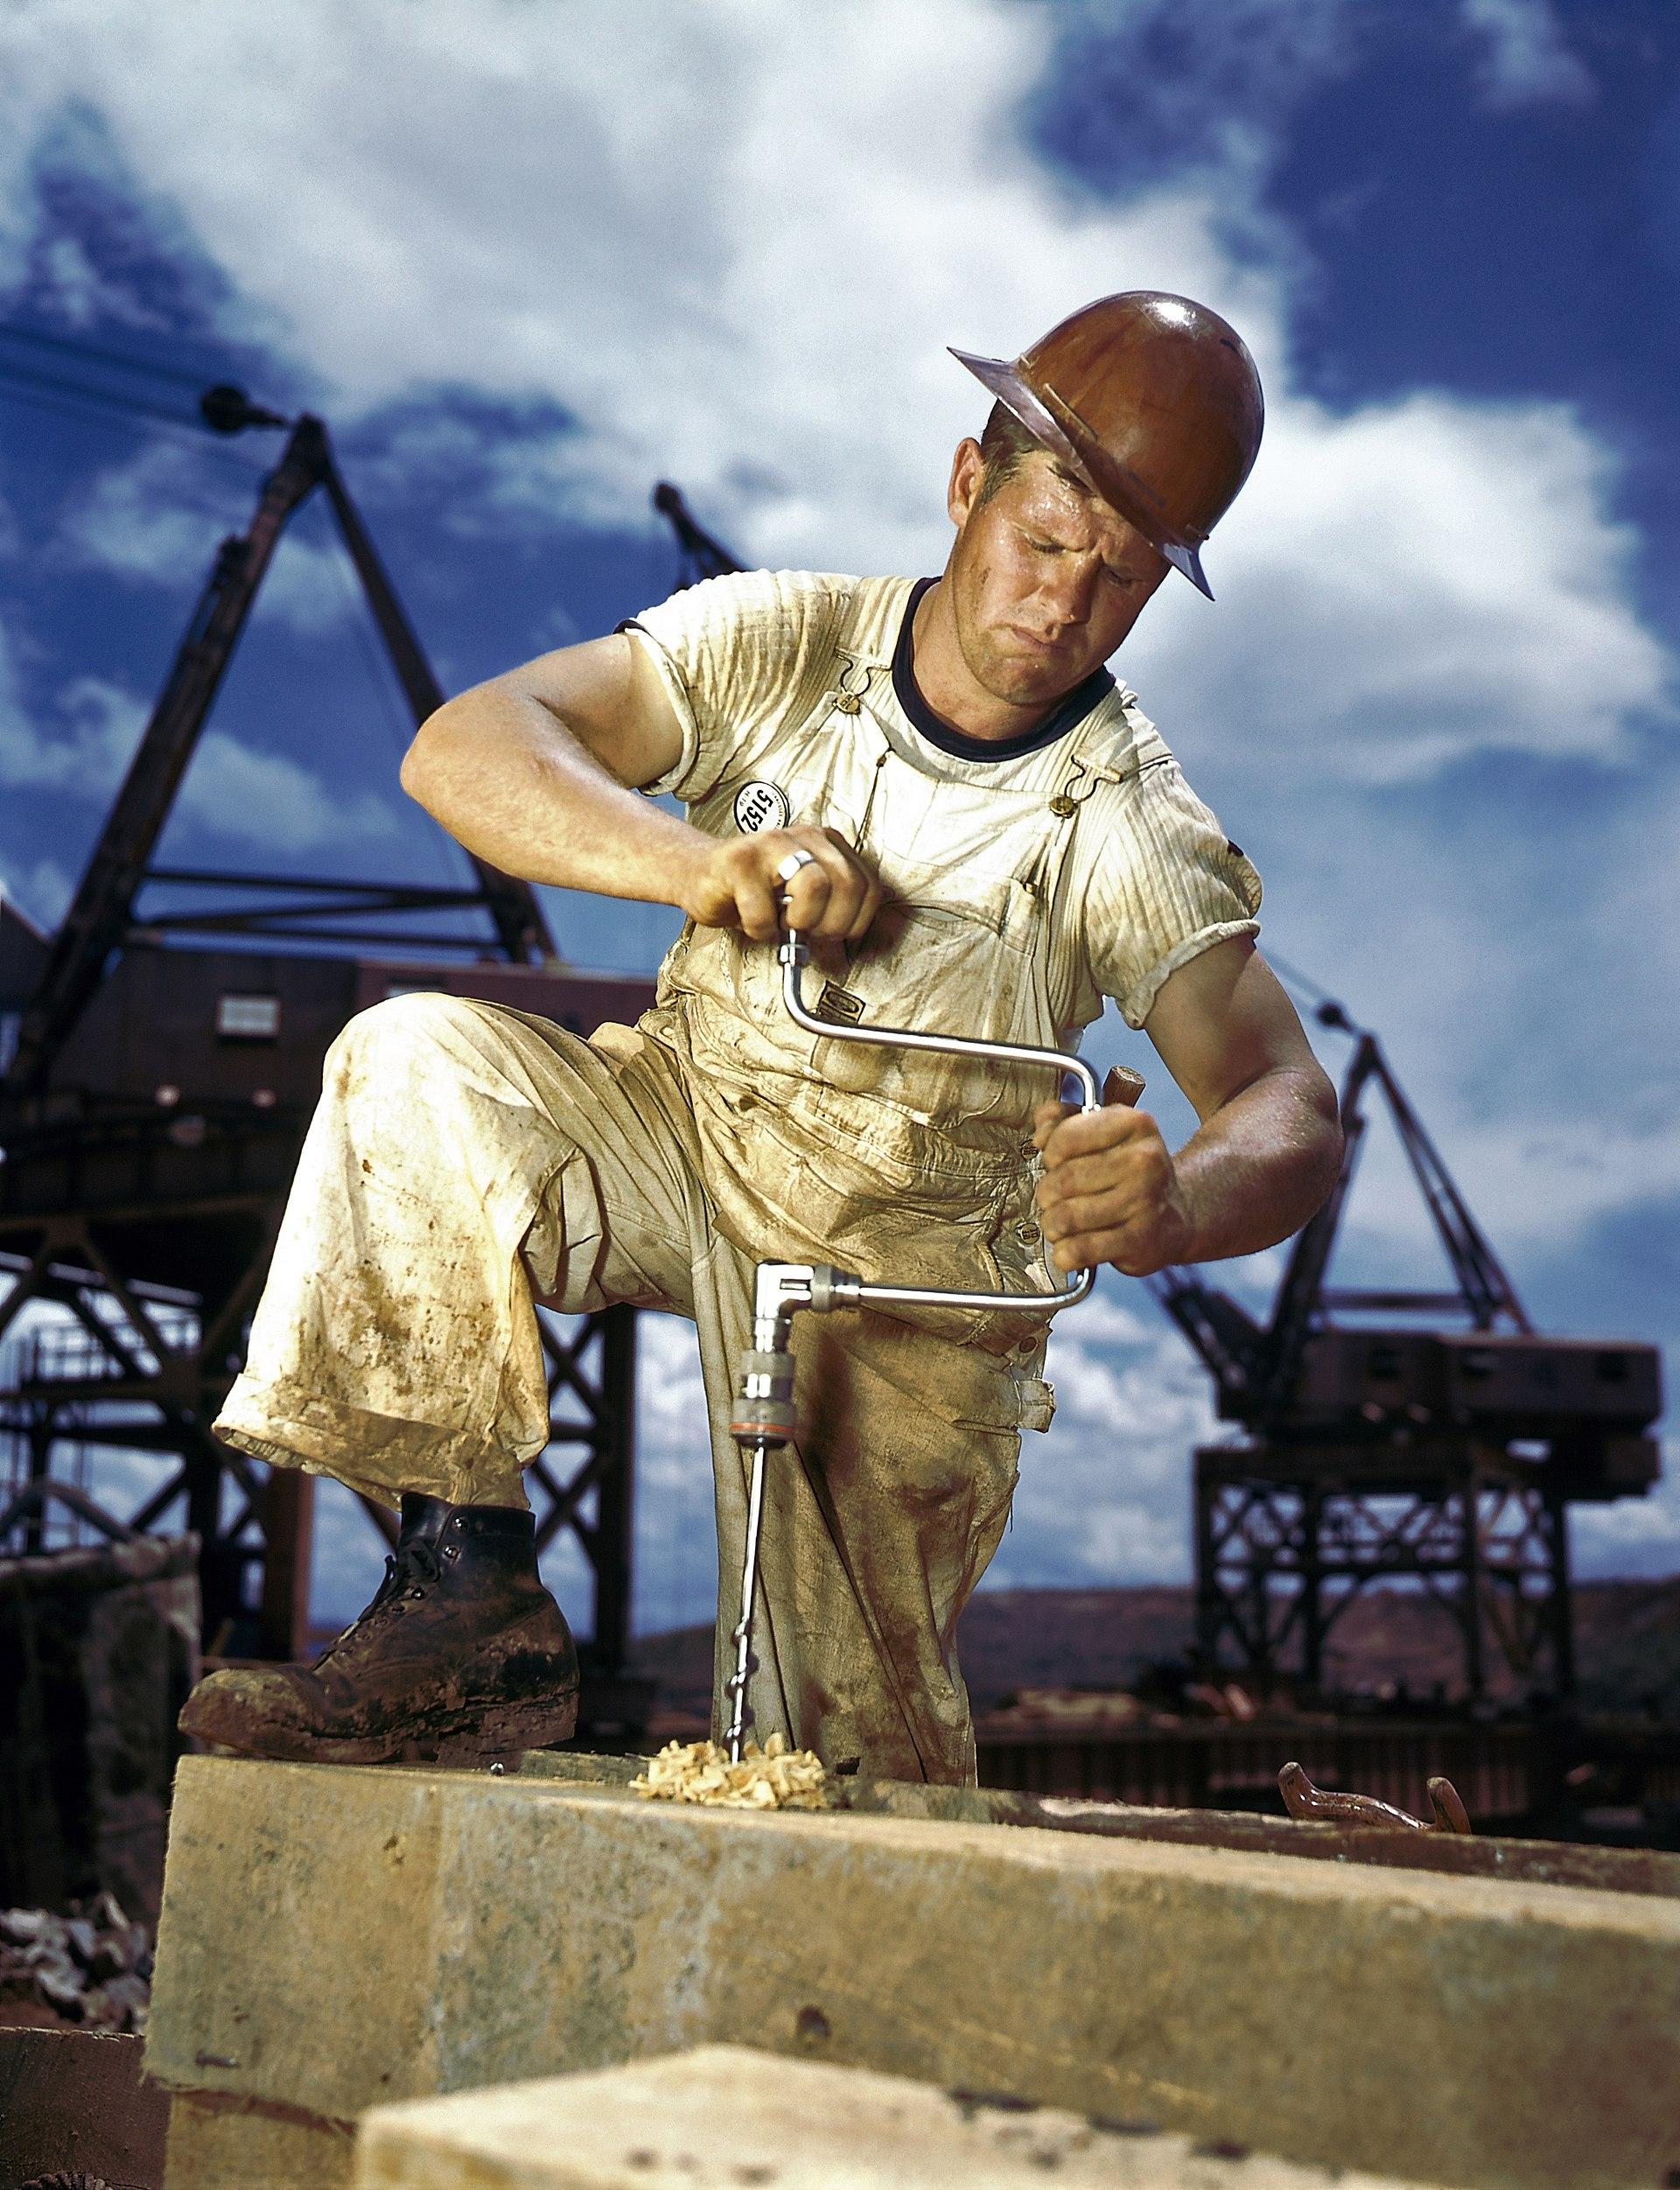 Oil Worker Cover Letter